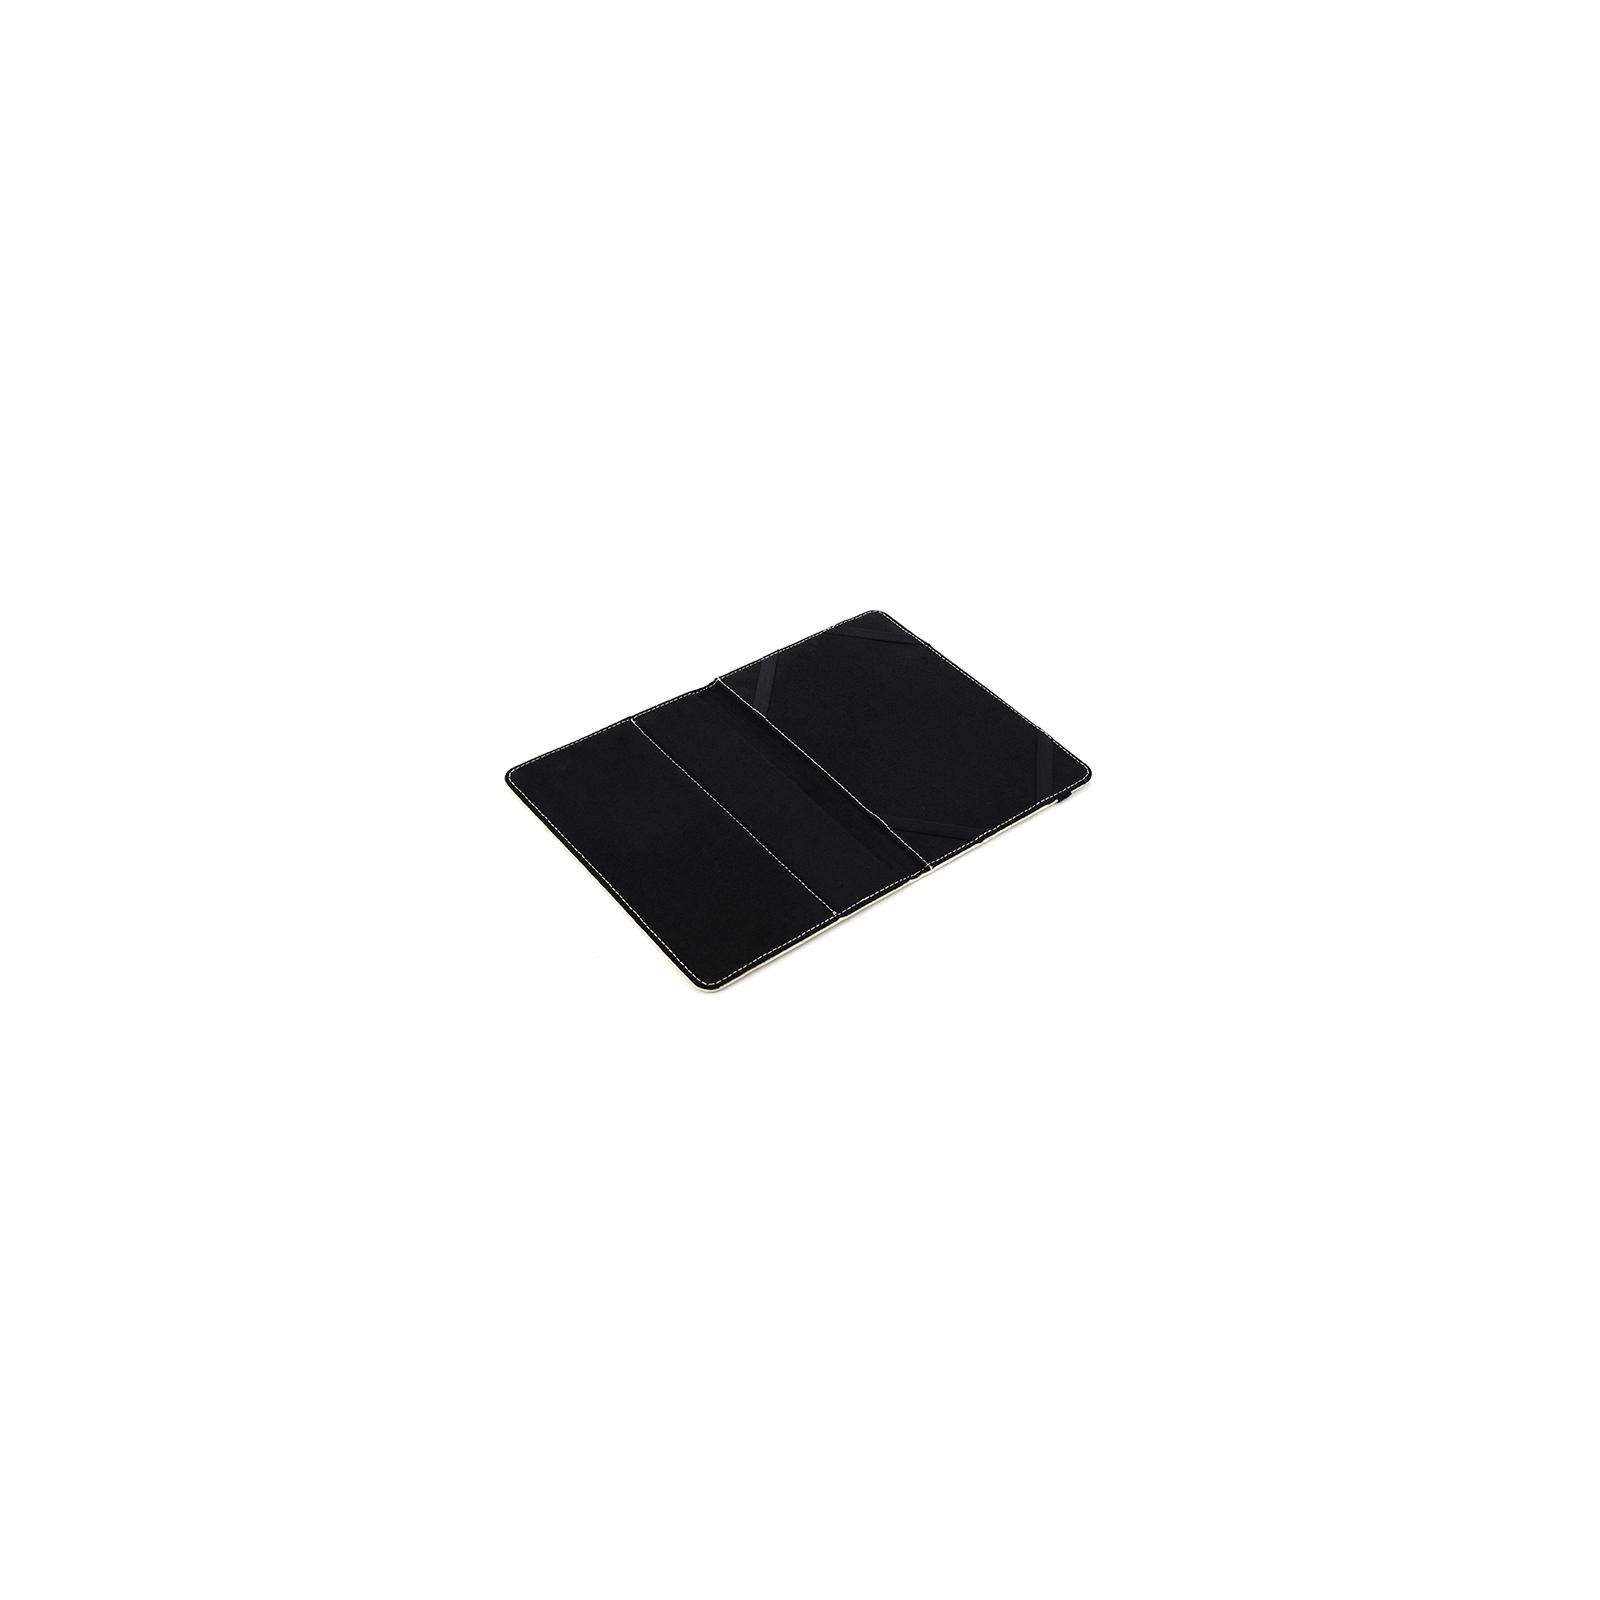 "Чехол для планшета 7"" Cover Stand Beige Drobak (216898) изображение 3"